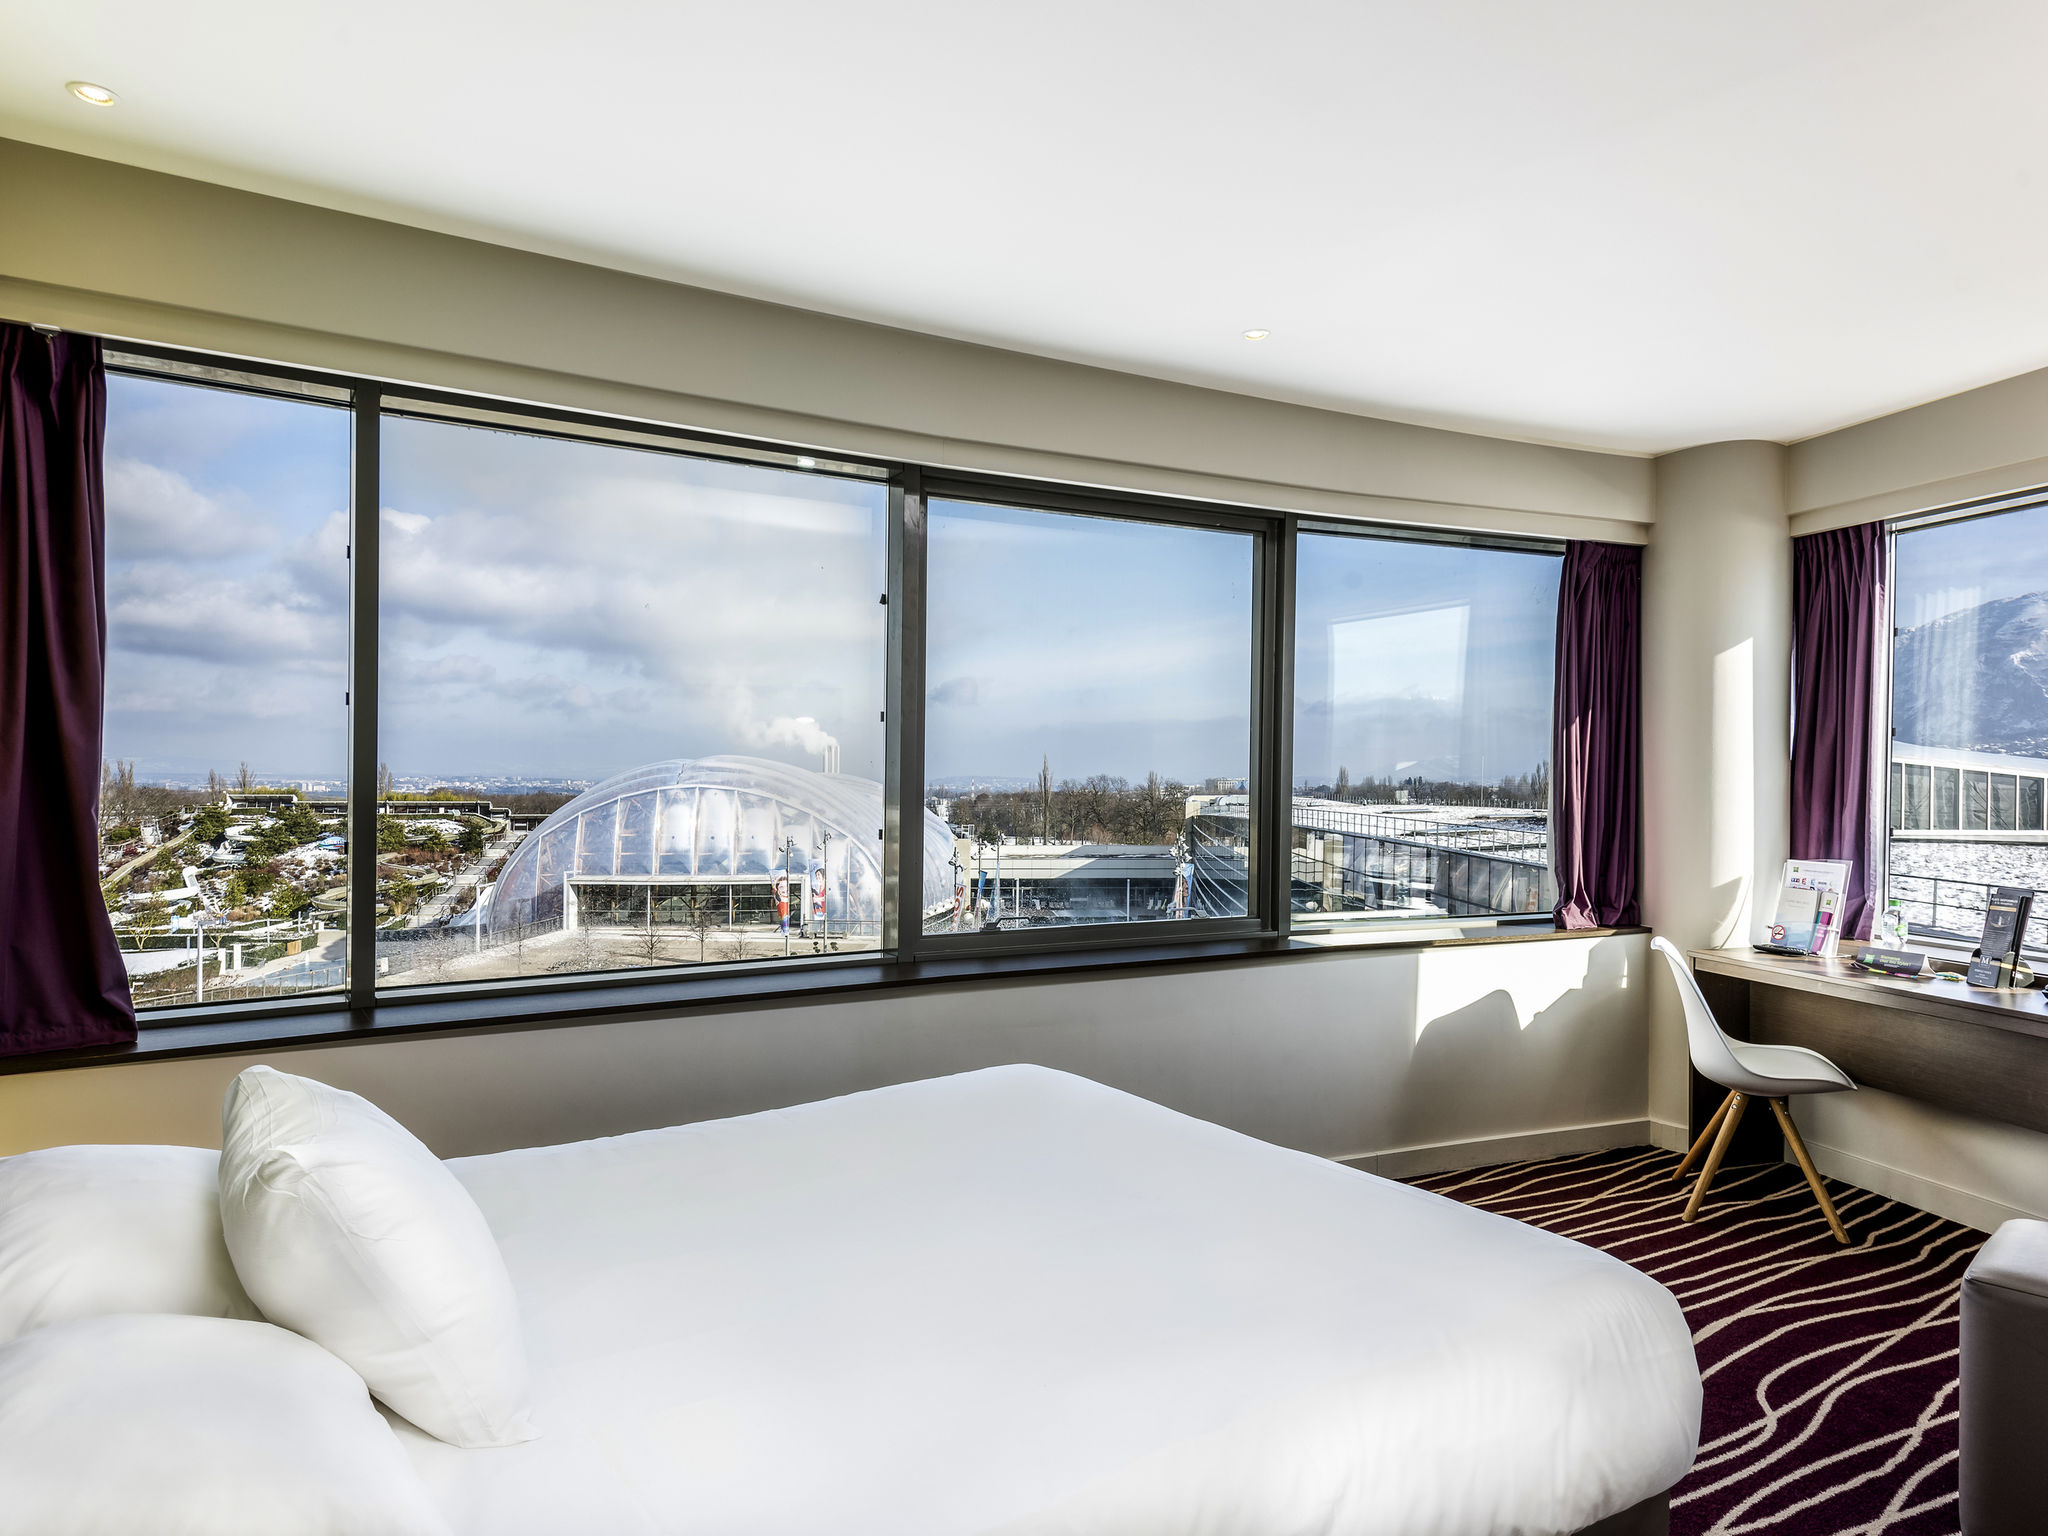 Hotel pas cher NEYDENS ibis Styles Saint Julien en Genevois Vitam